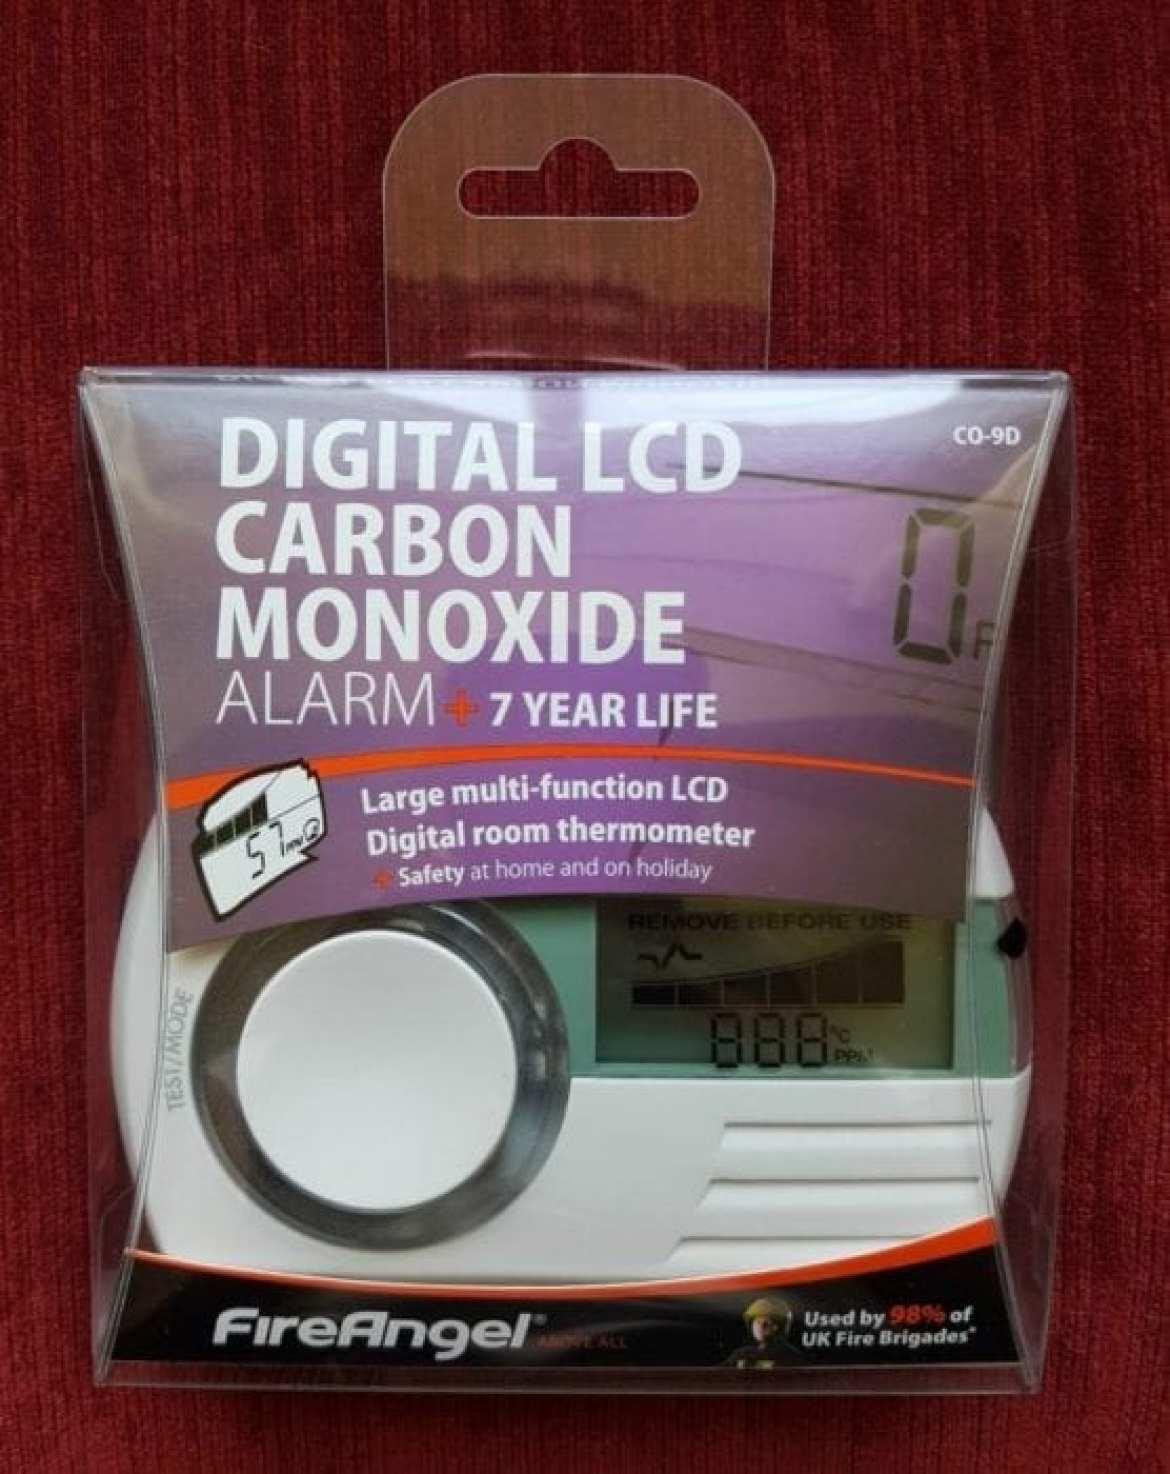 Raising Awareness Of Carbon Monoxide With Project Shout